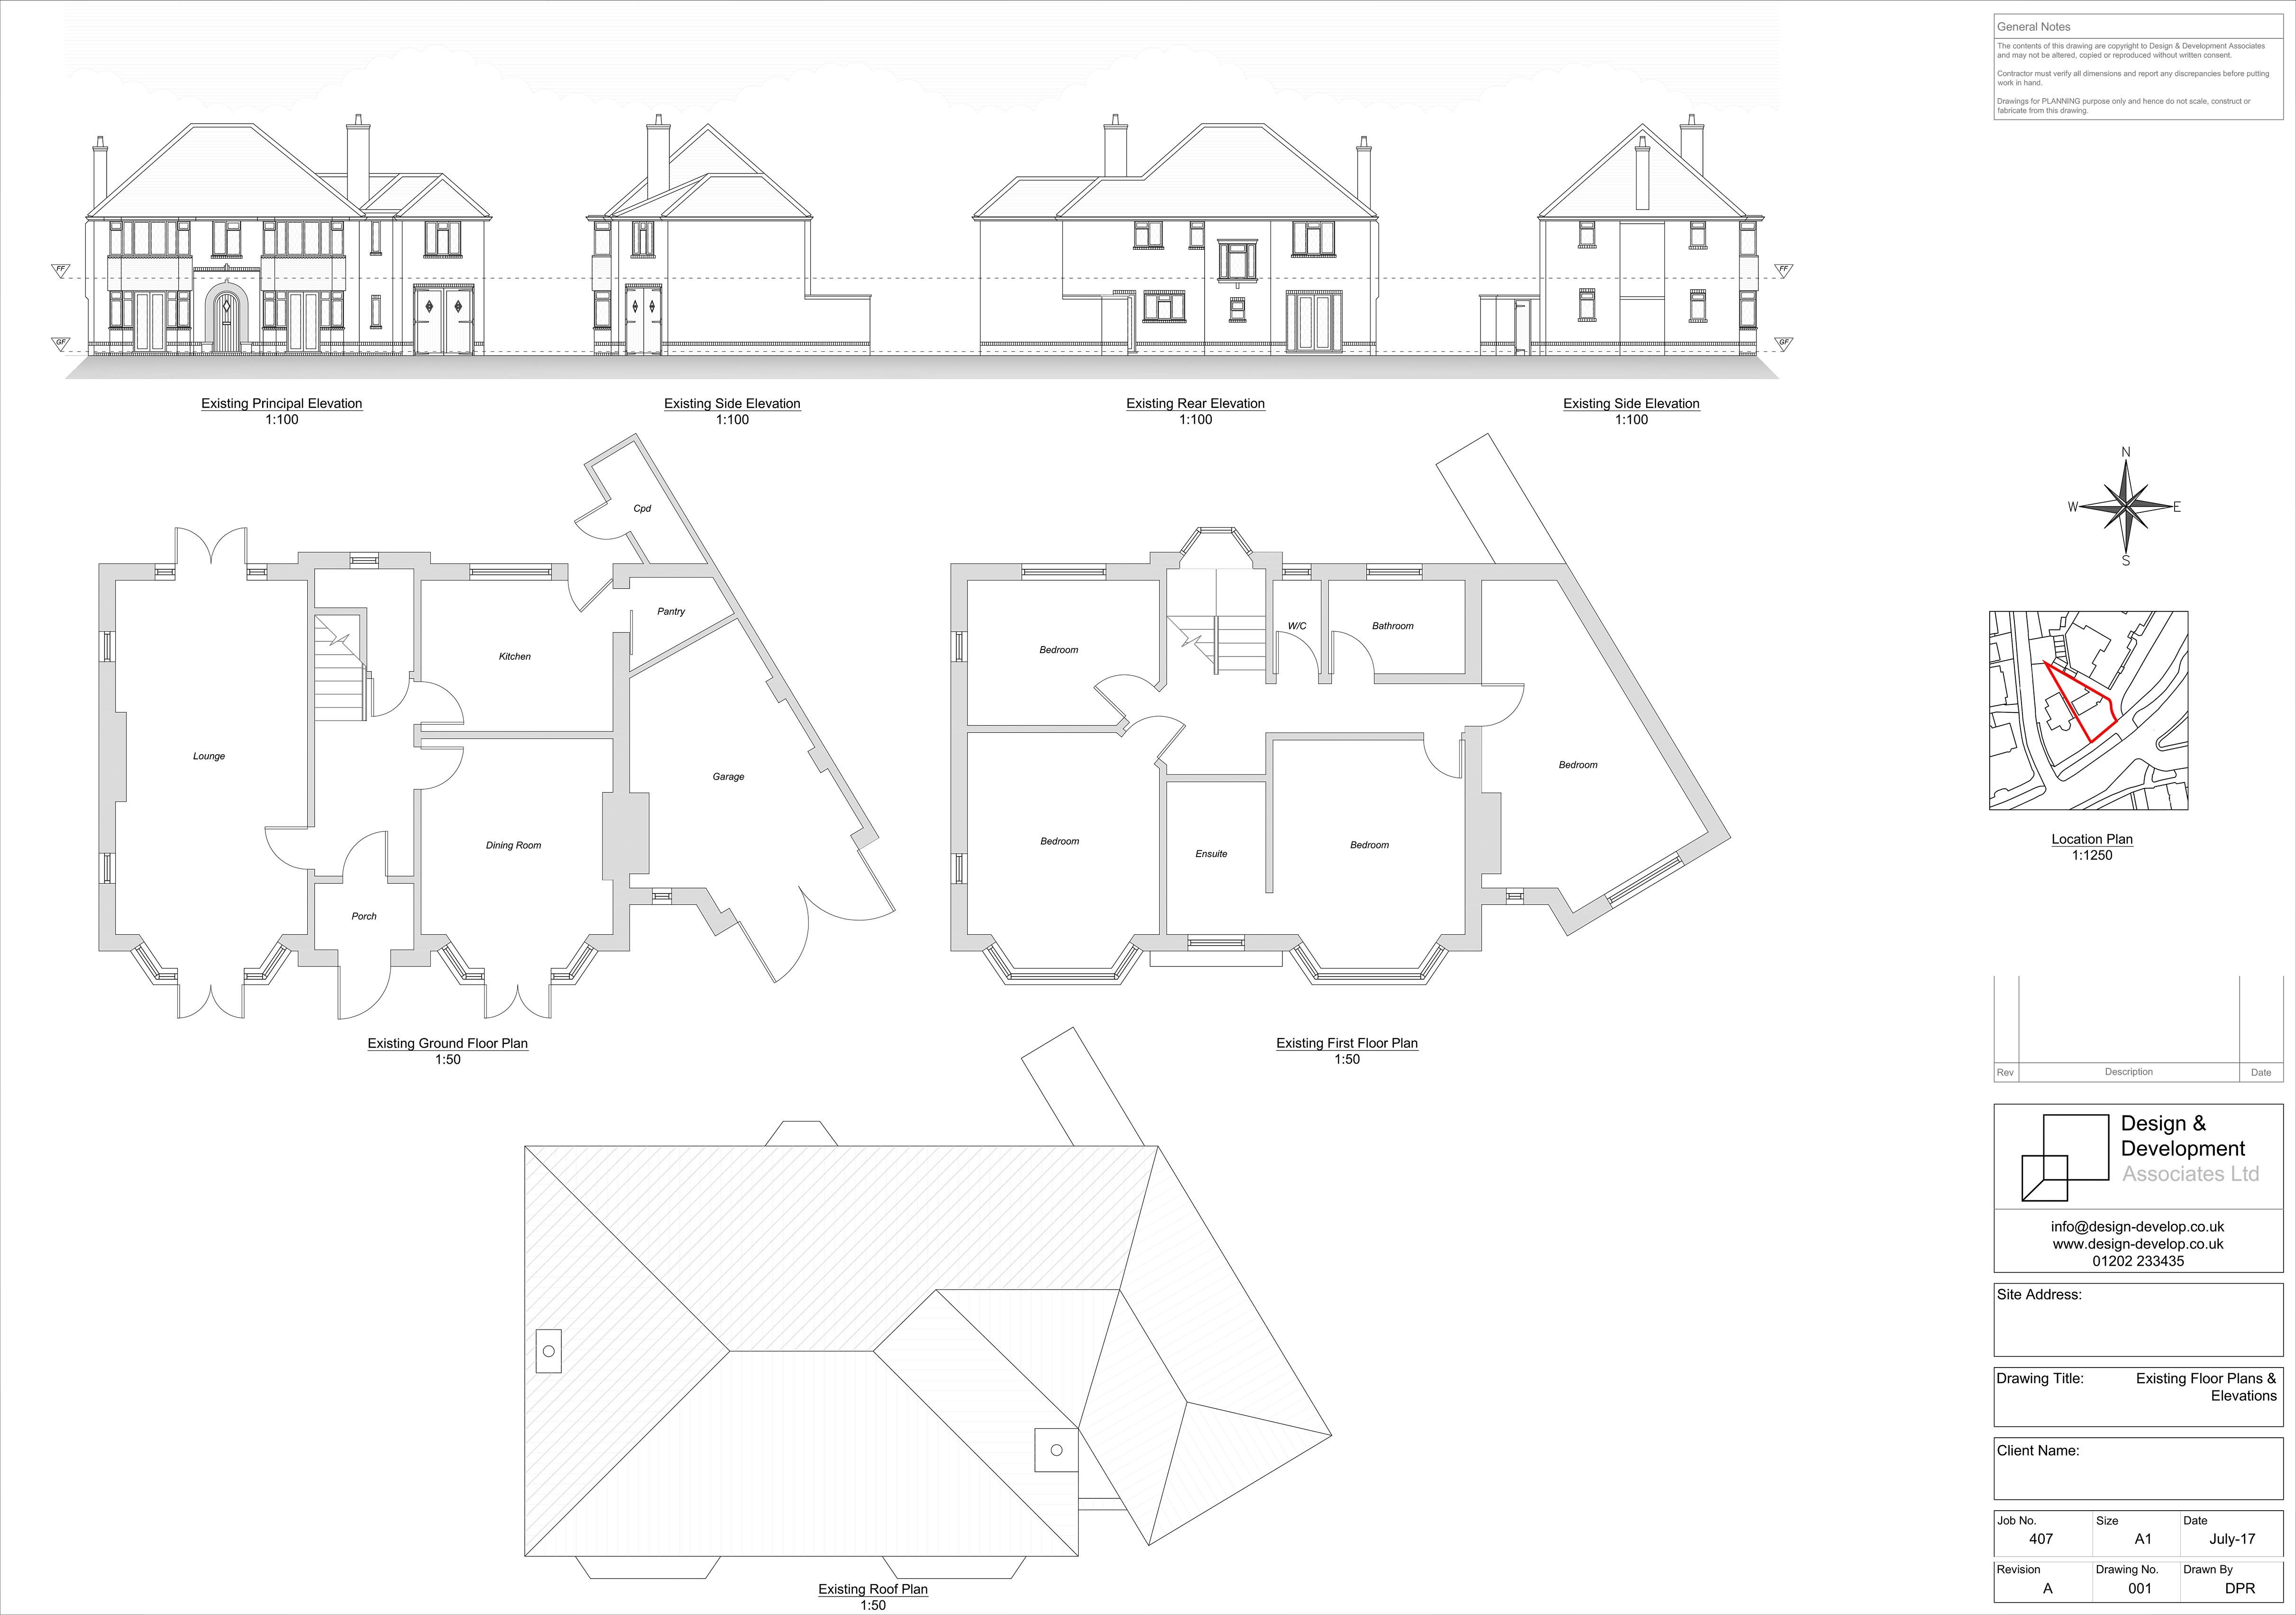 Existing Floor Plans